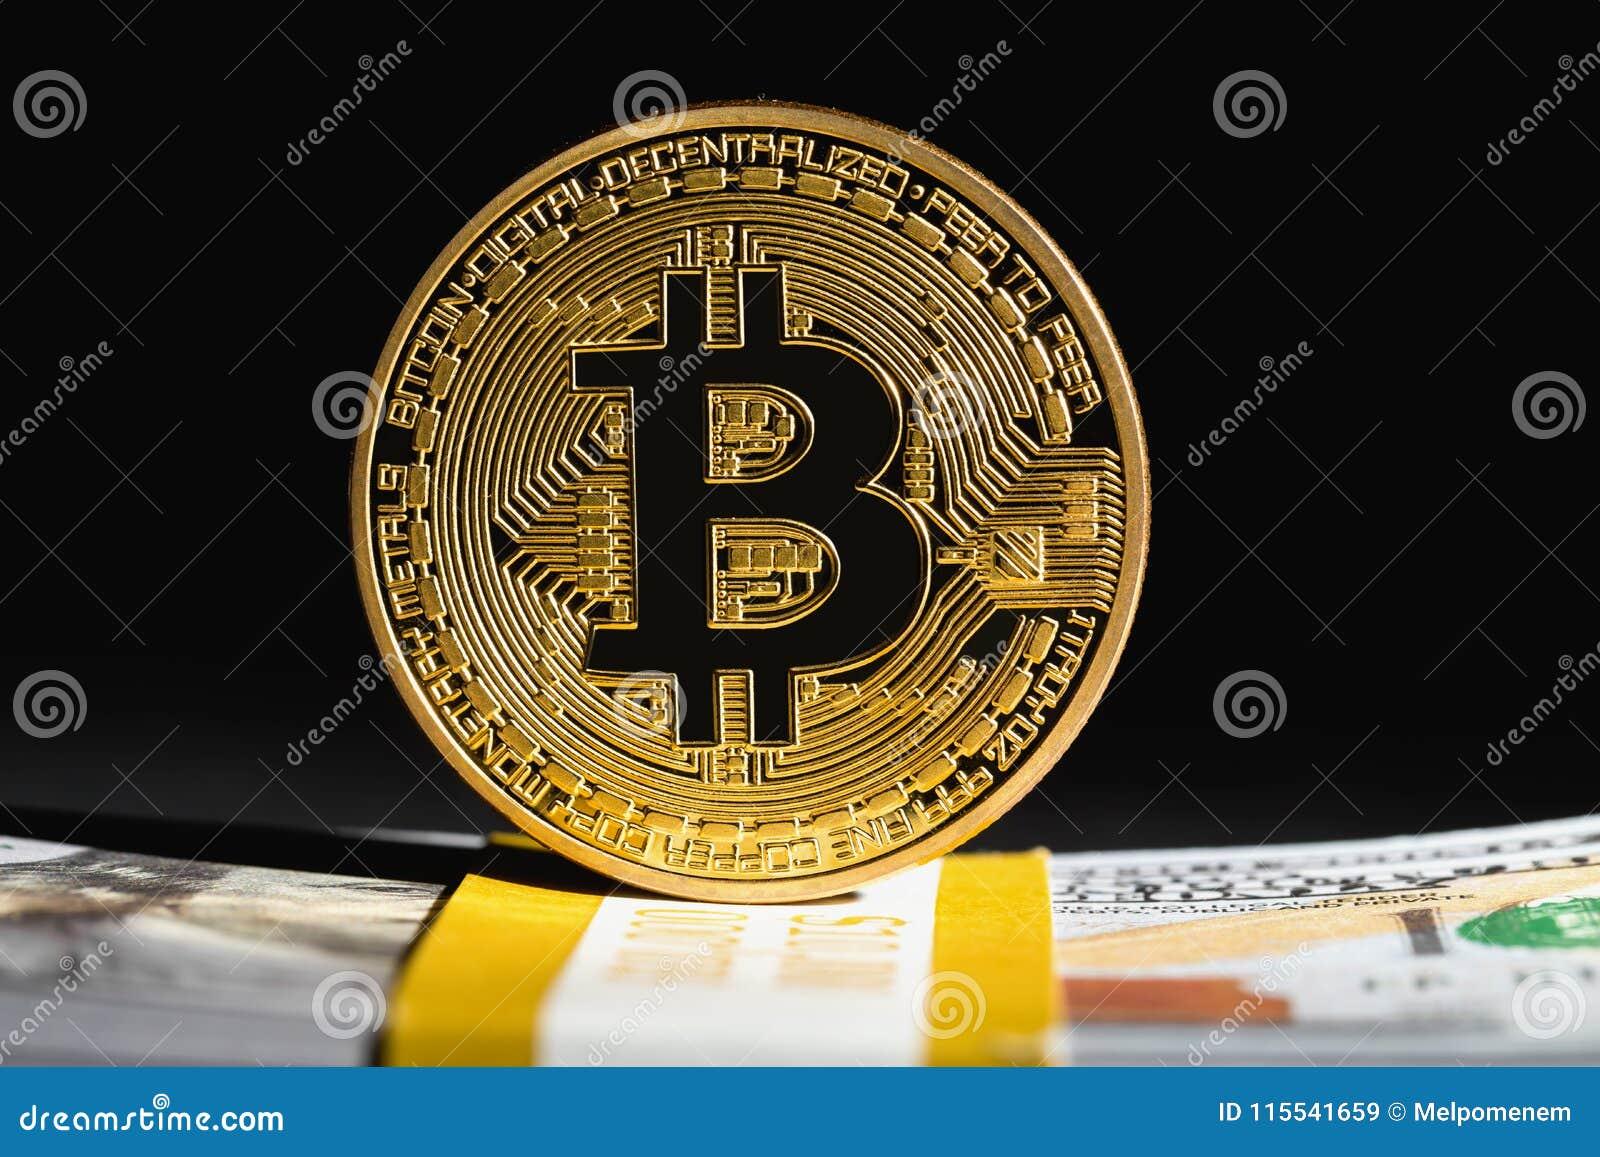 coinb in bitcoin cash